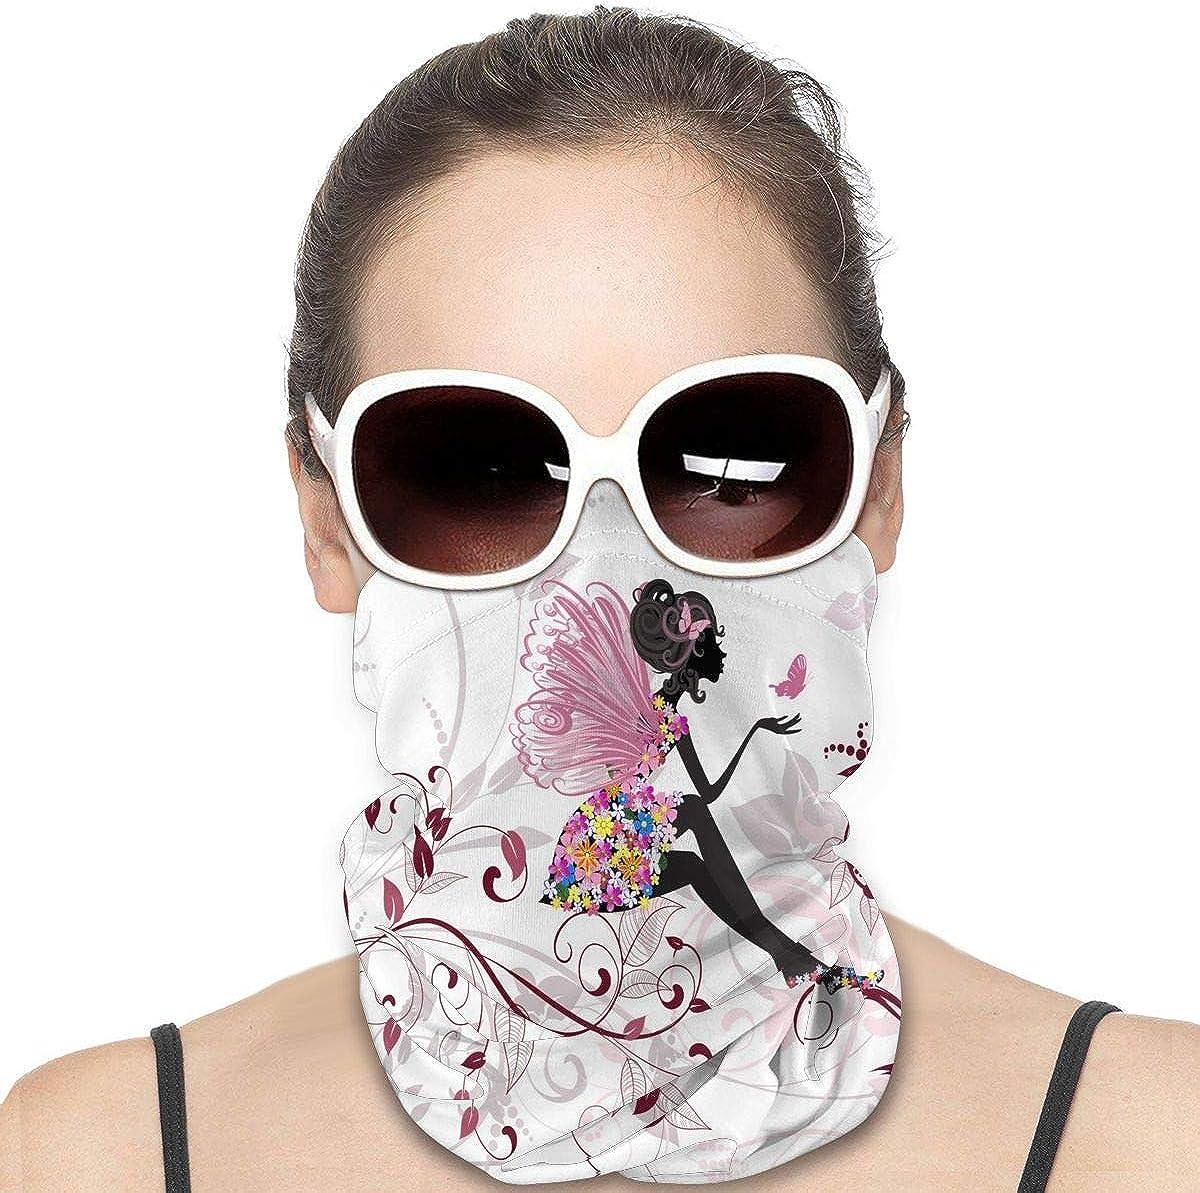 KiuLoam Women Bandanas Face Mask, Beauty Butterfly Girl with Flowers Neck Gaiter Mask Headband for Men Face Scarf Dust, Outdoors, Sports